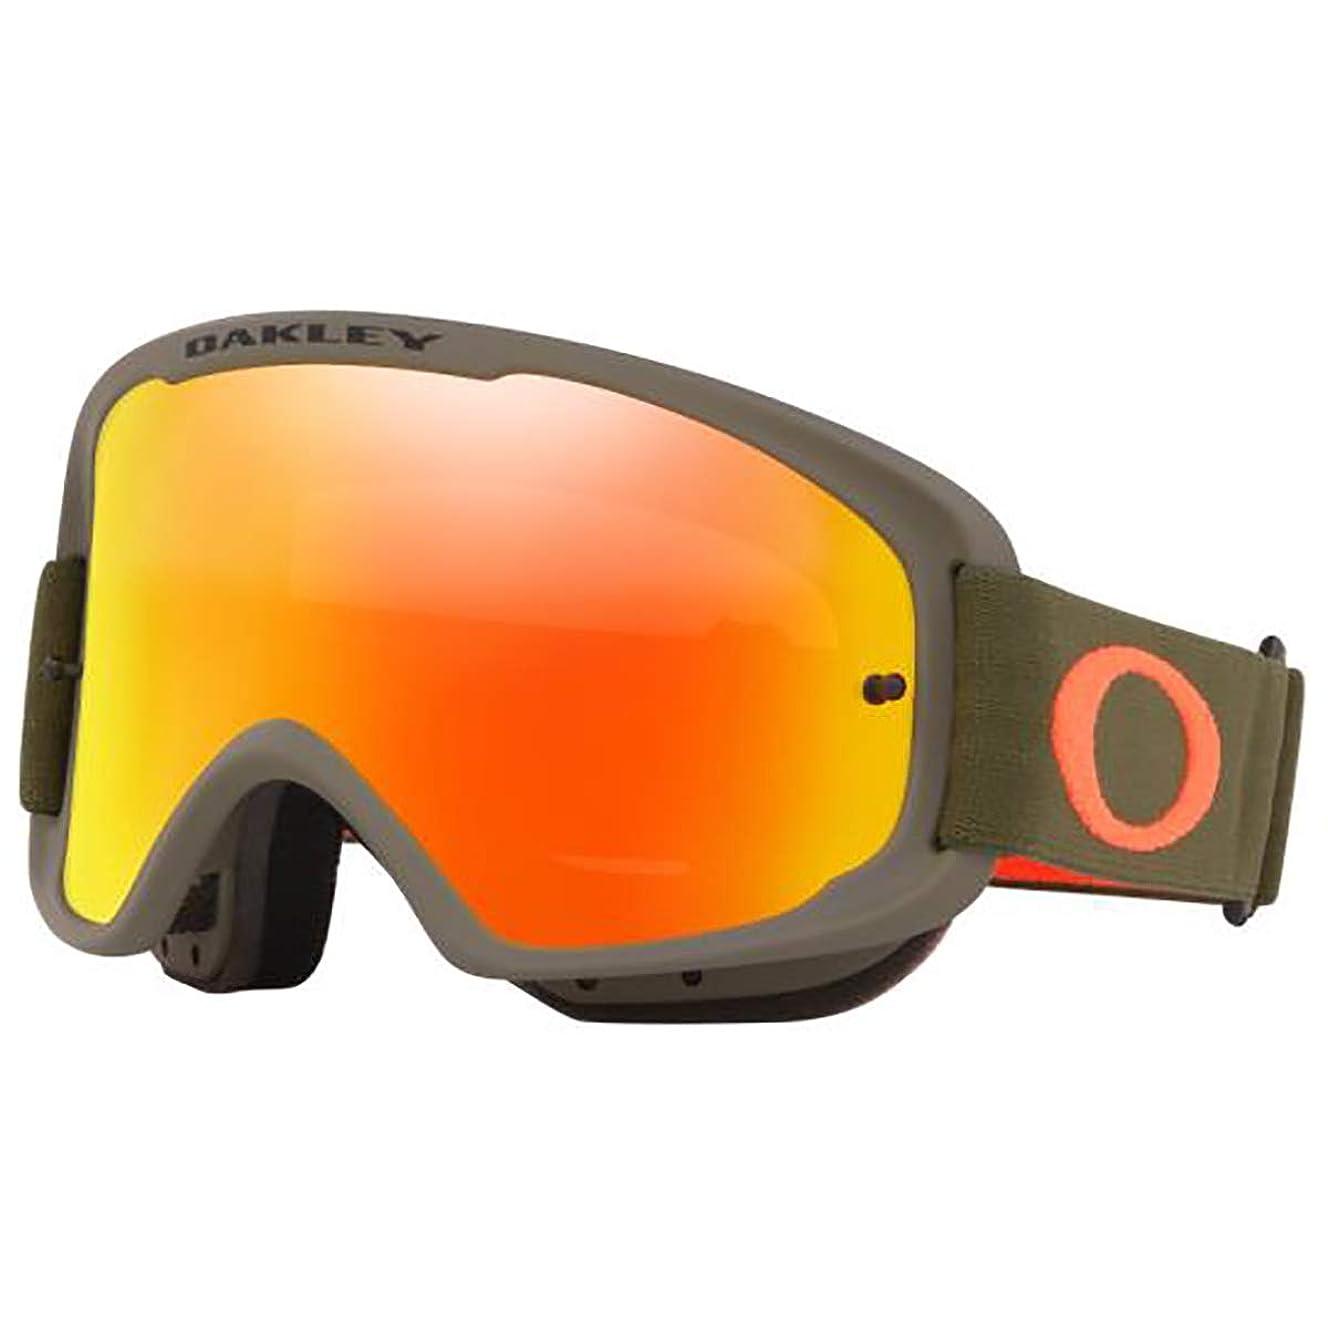 Oakley O-Frame 2.0 Men's MTB Off-Road Cycling Goggles - Dark Brush Orange/Fire Iridium & Clear/One Size